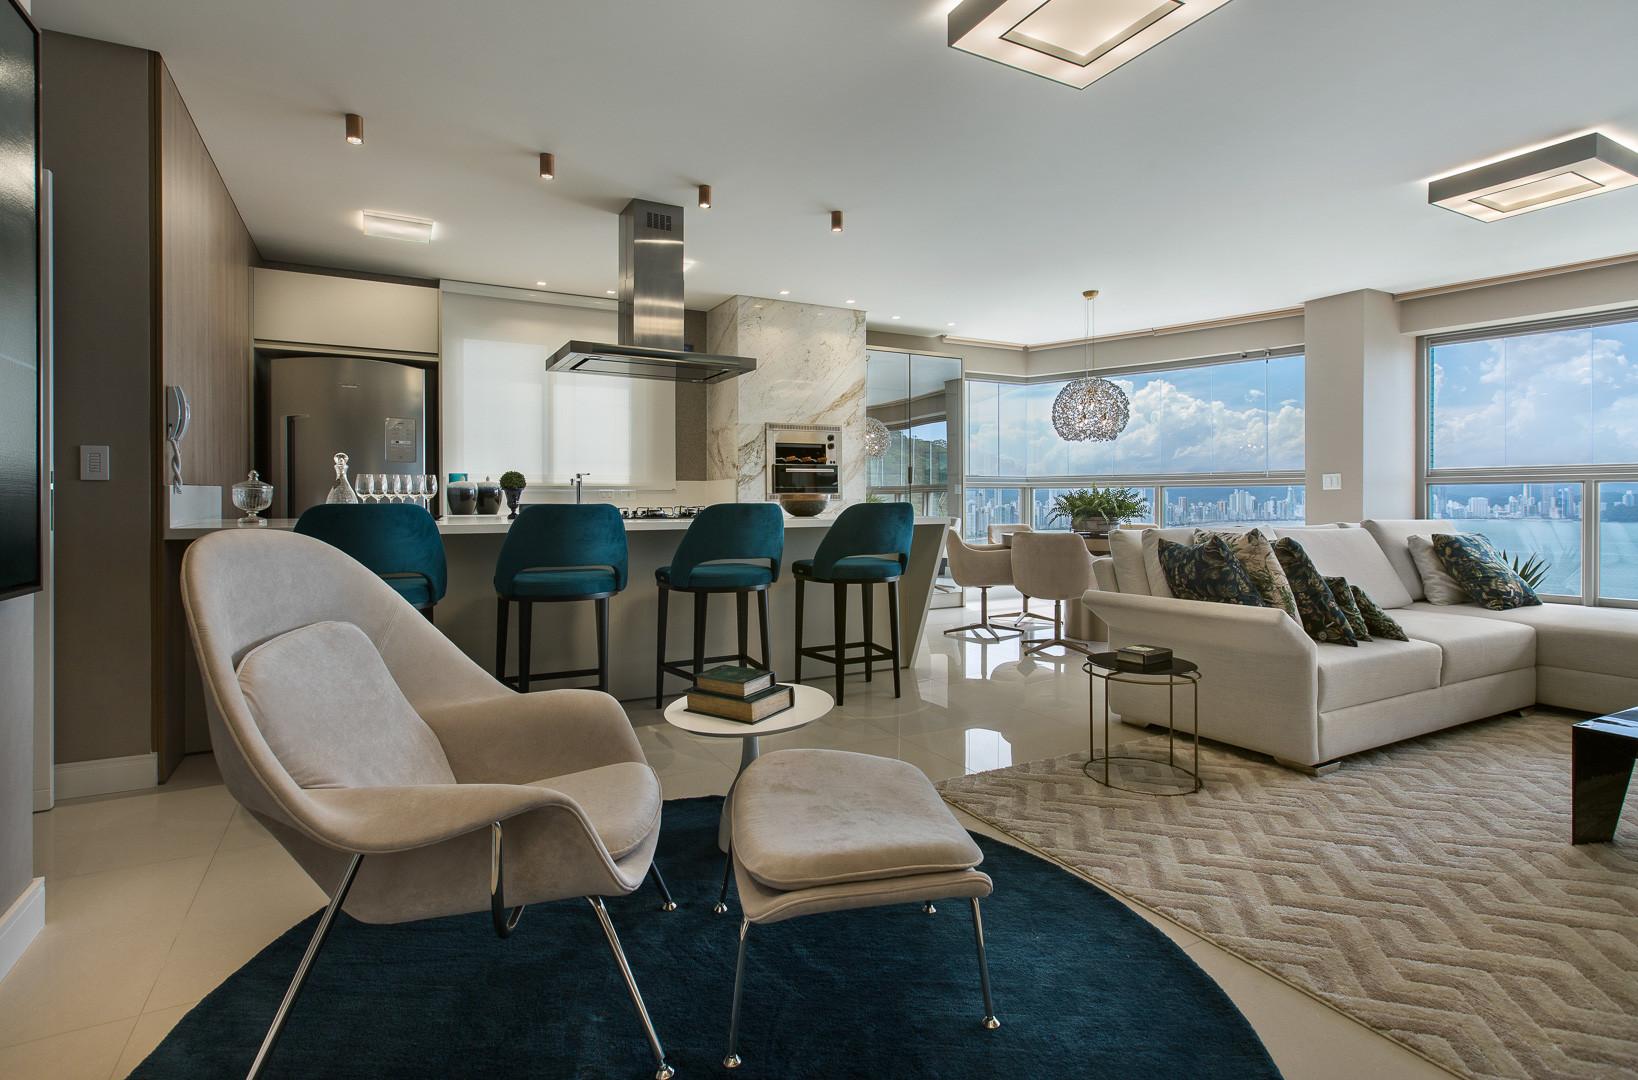 baturite-lounge-house-living-detalhe.jpg